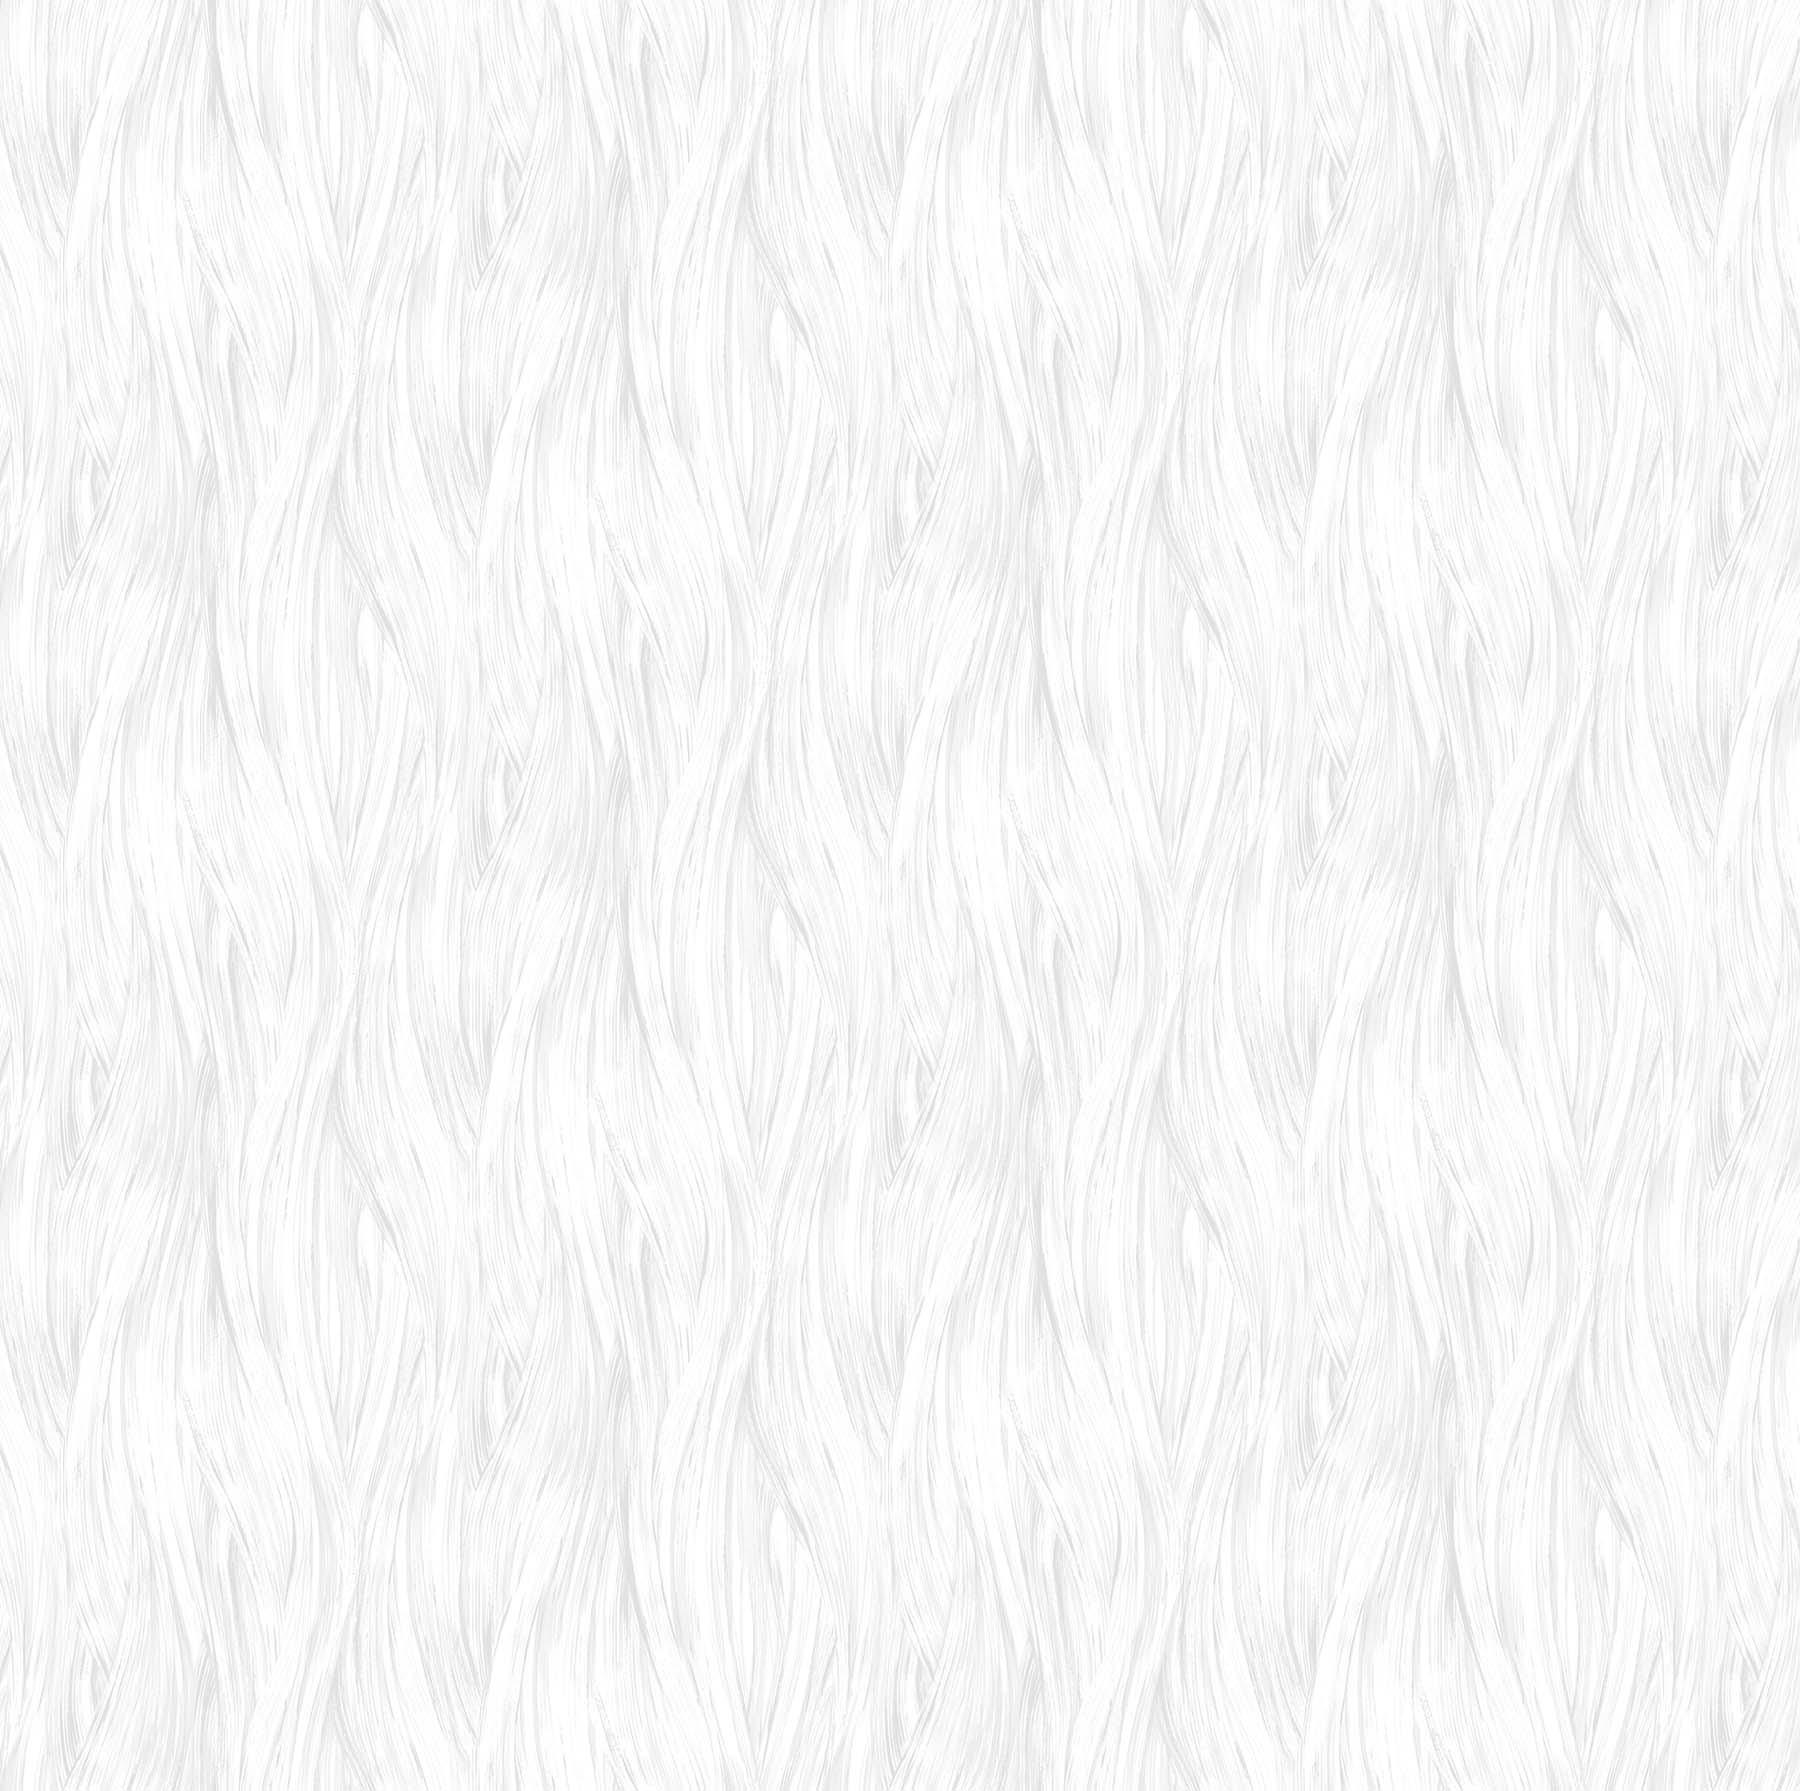 WINDSONG WHITE GRAY